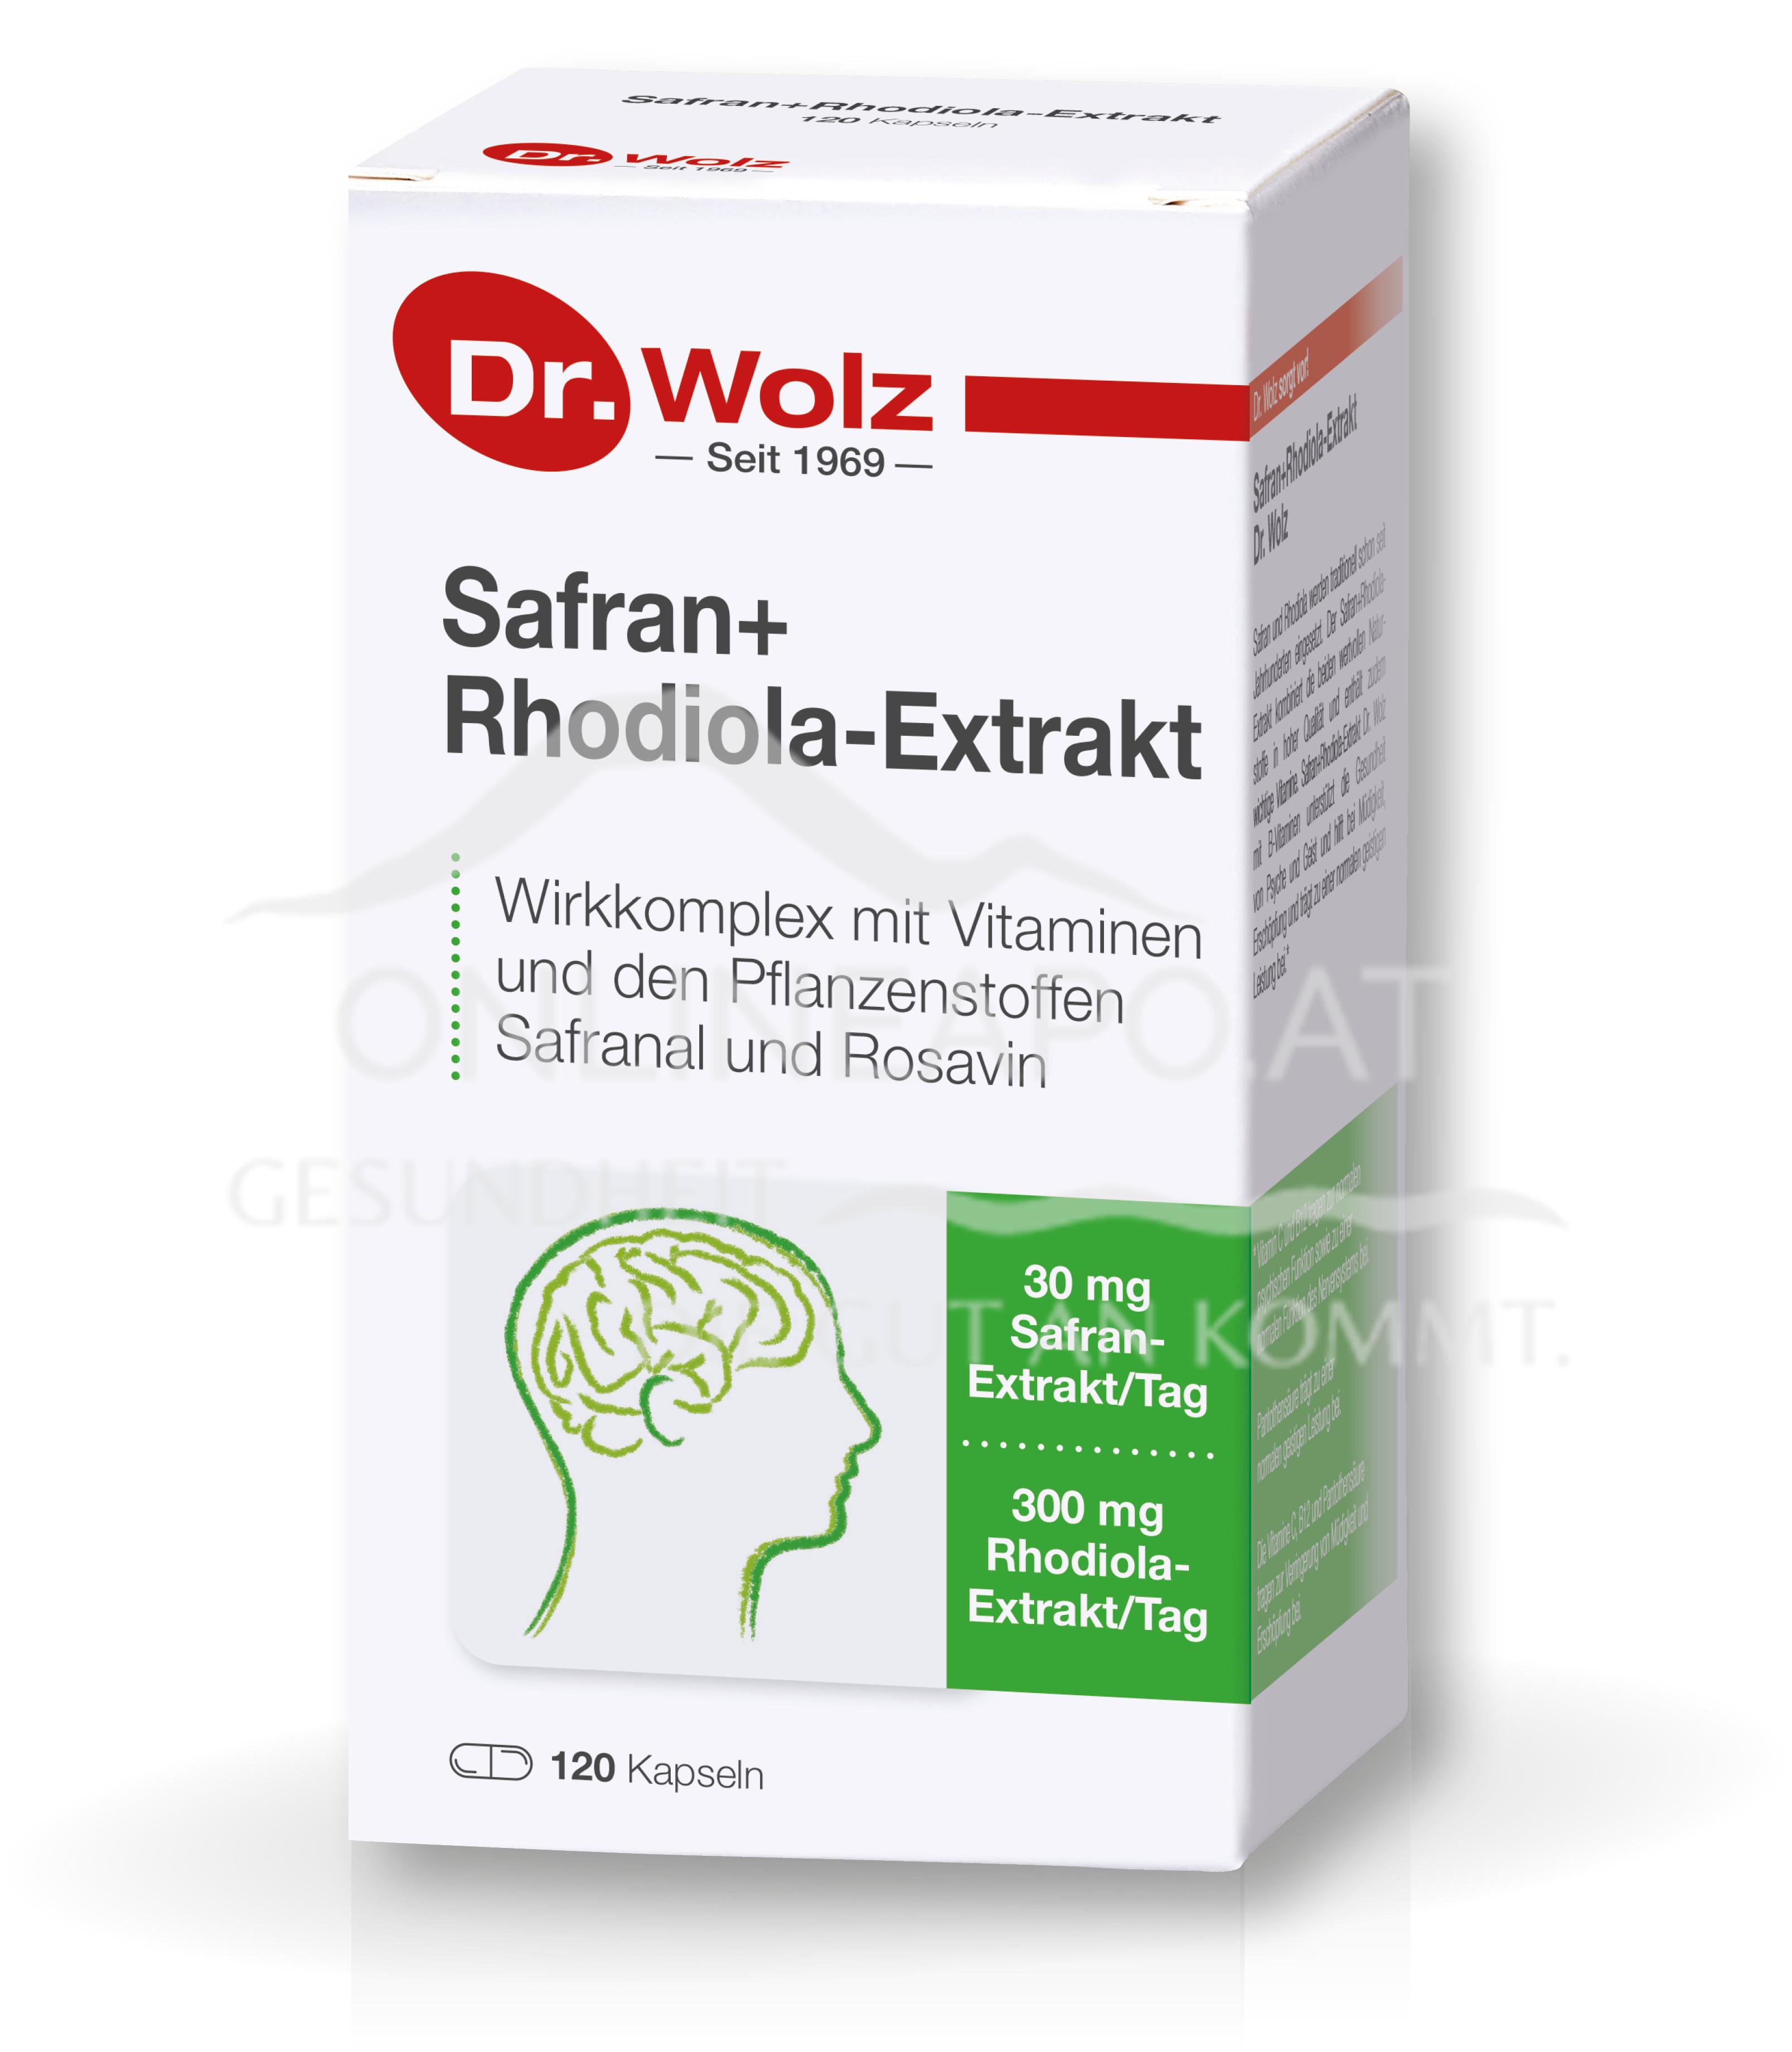 Dr. Wolz Safran+Rhodiola-Extrakt Kapseln